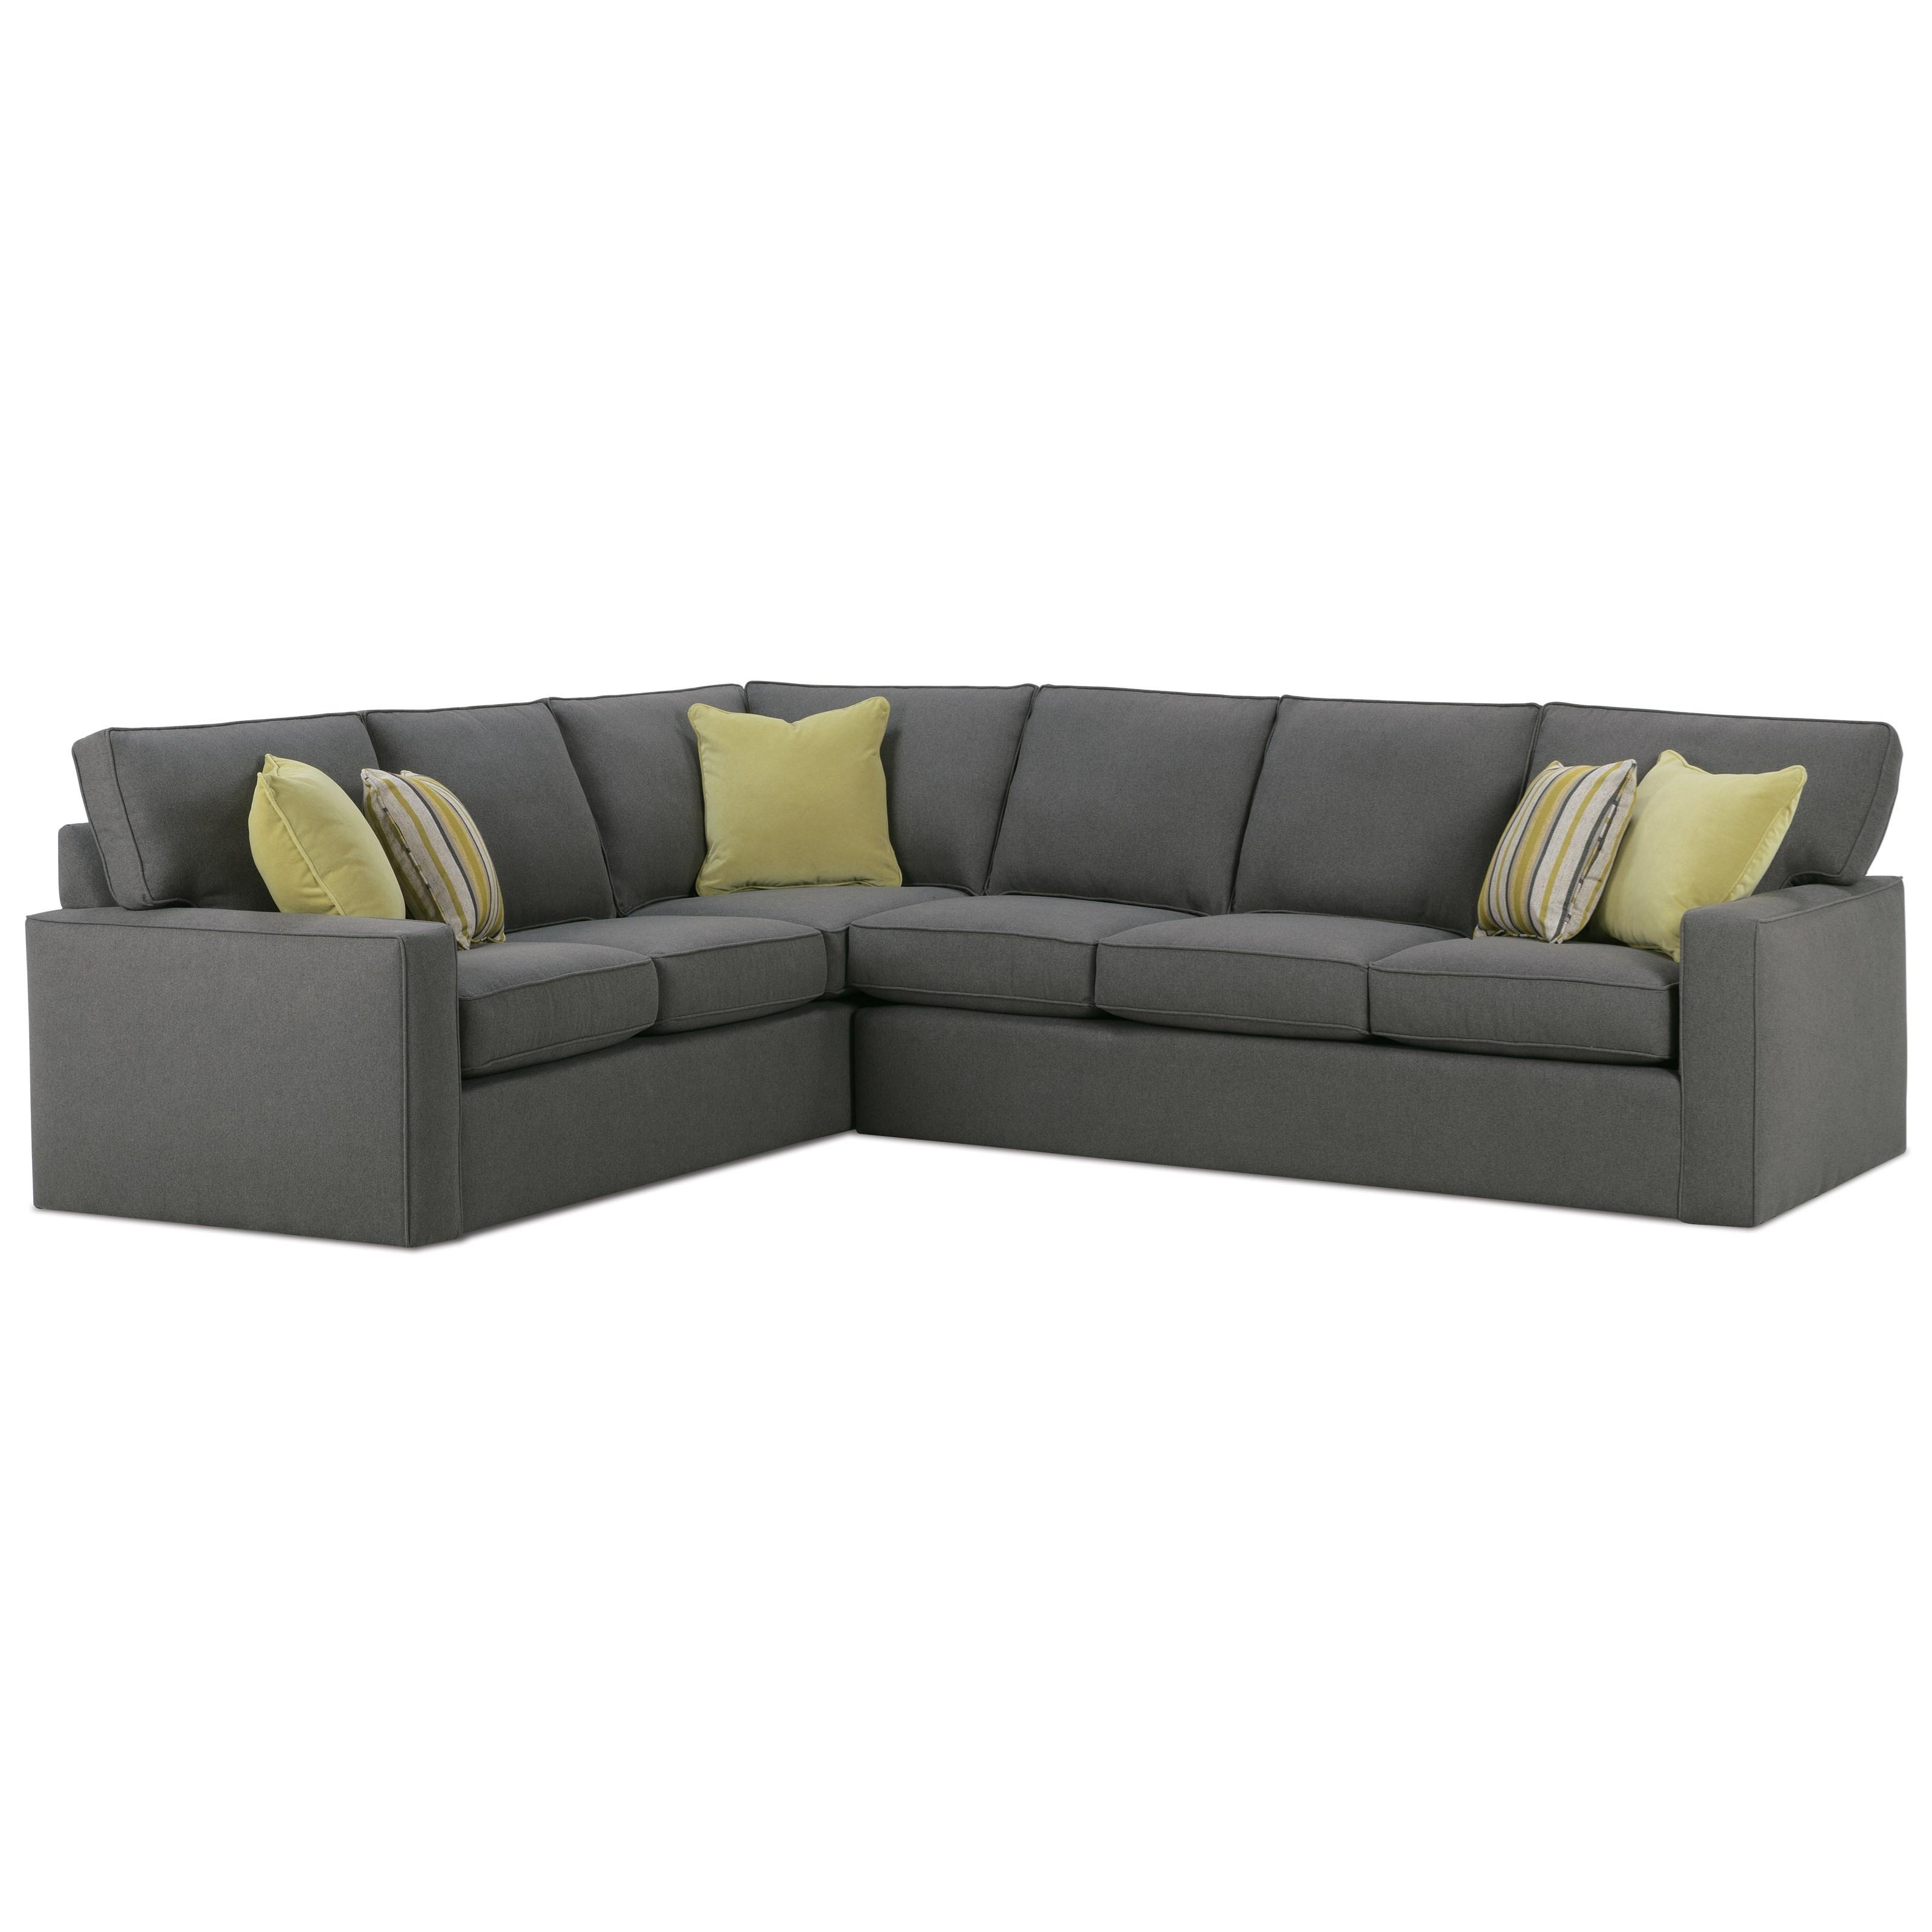 Monaco Sectional Sofa by Rowe at Bullard Furniture